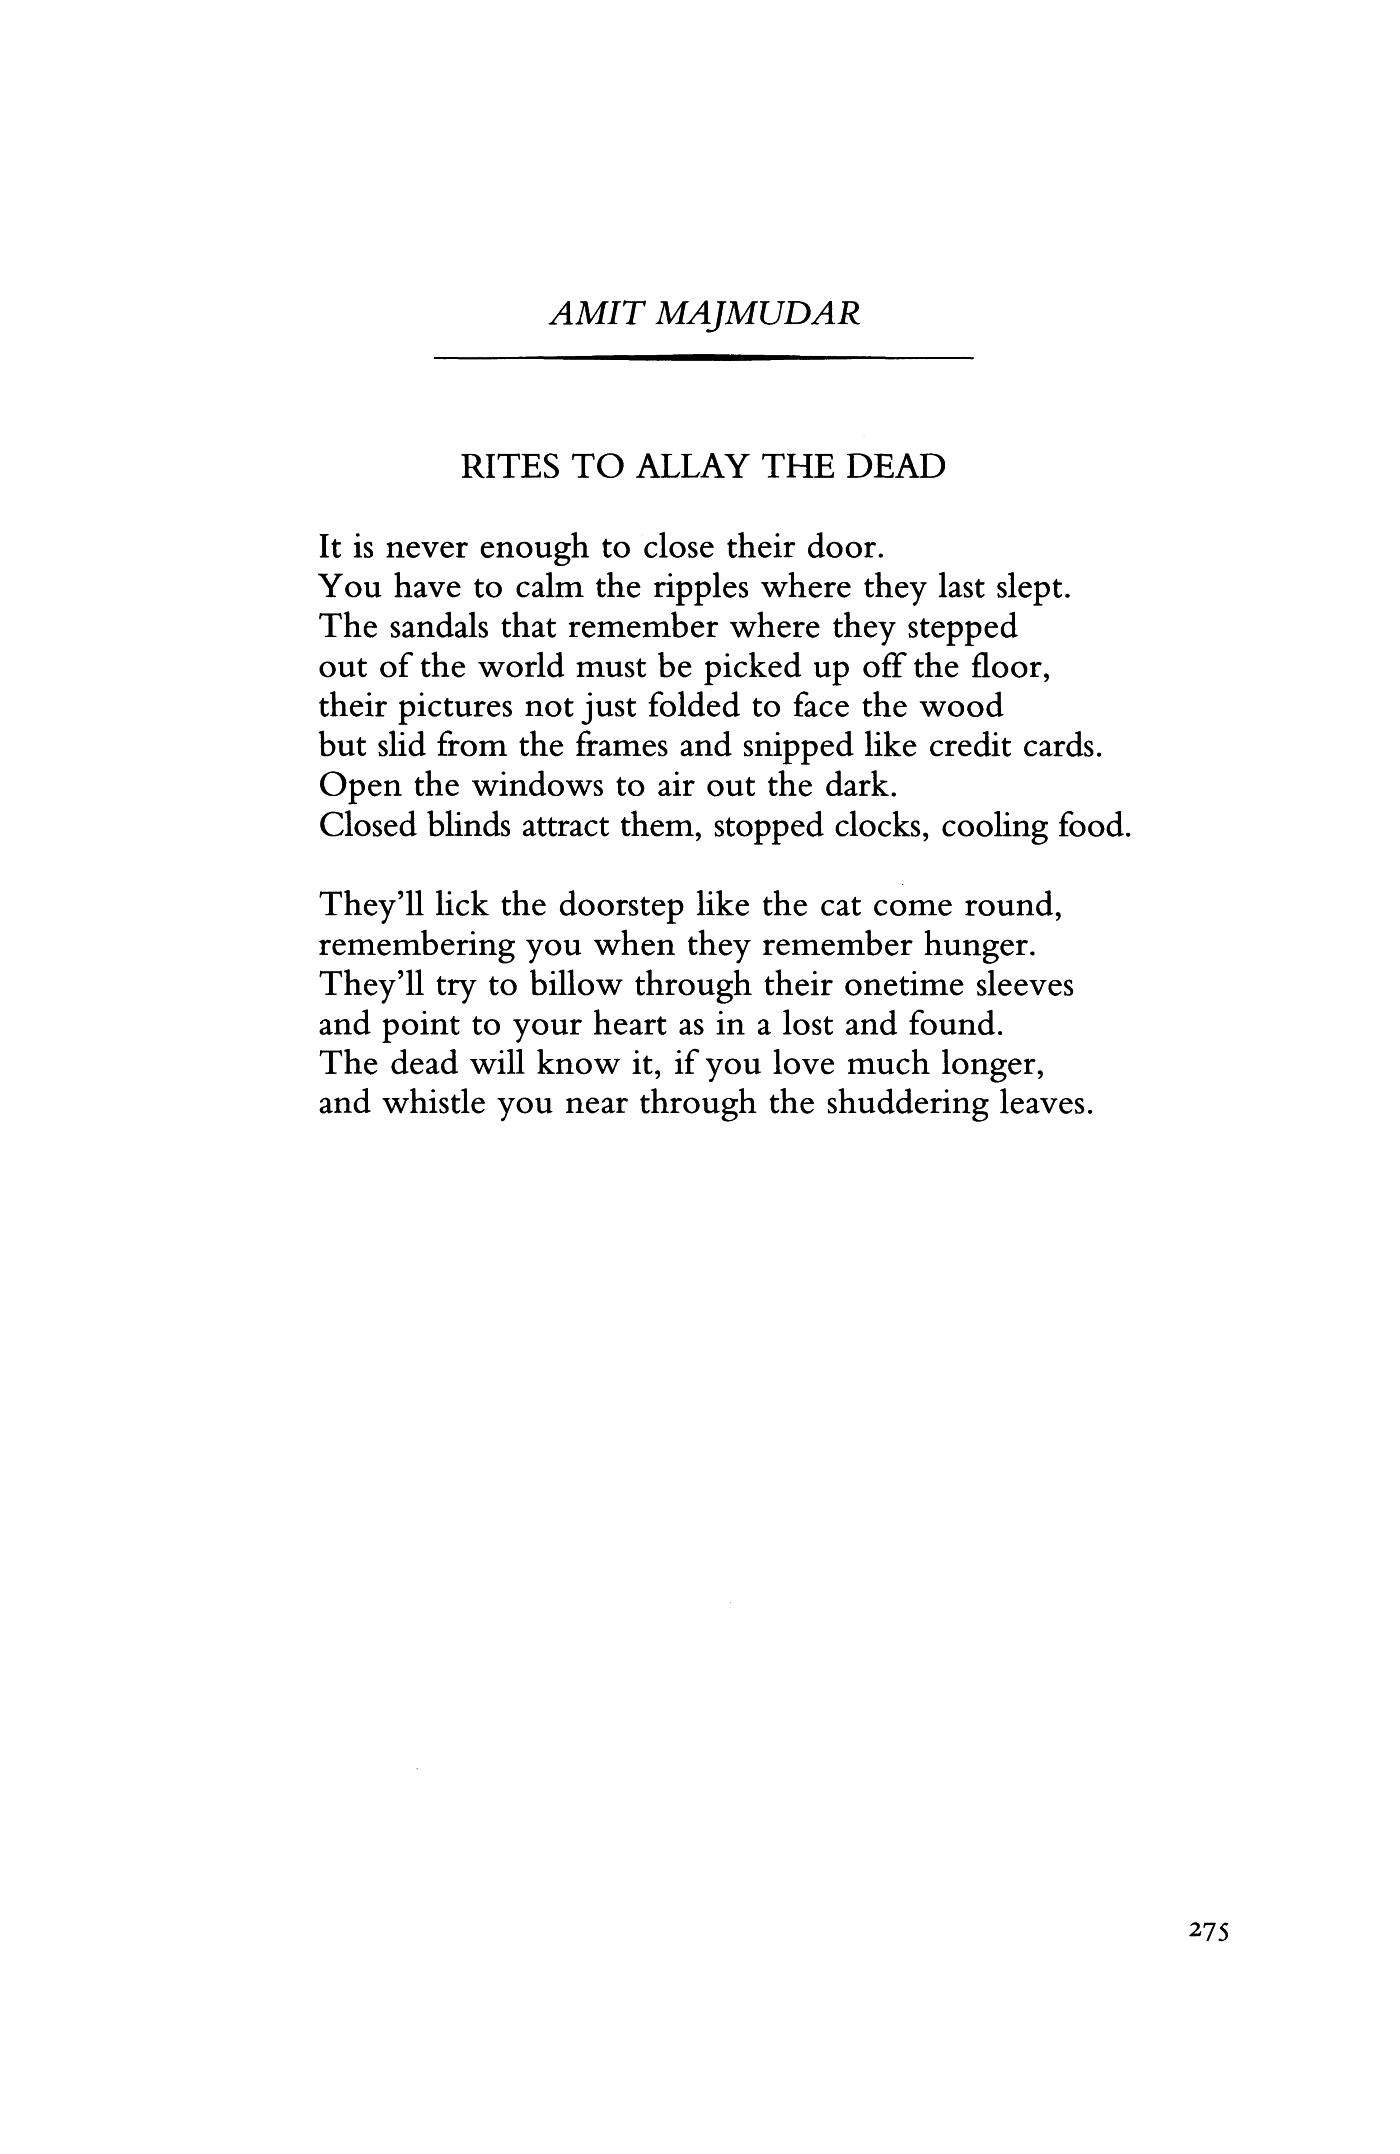 Irites to allay the deadi by amit majmudar essay